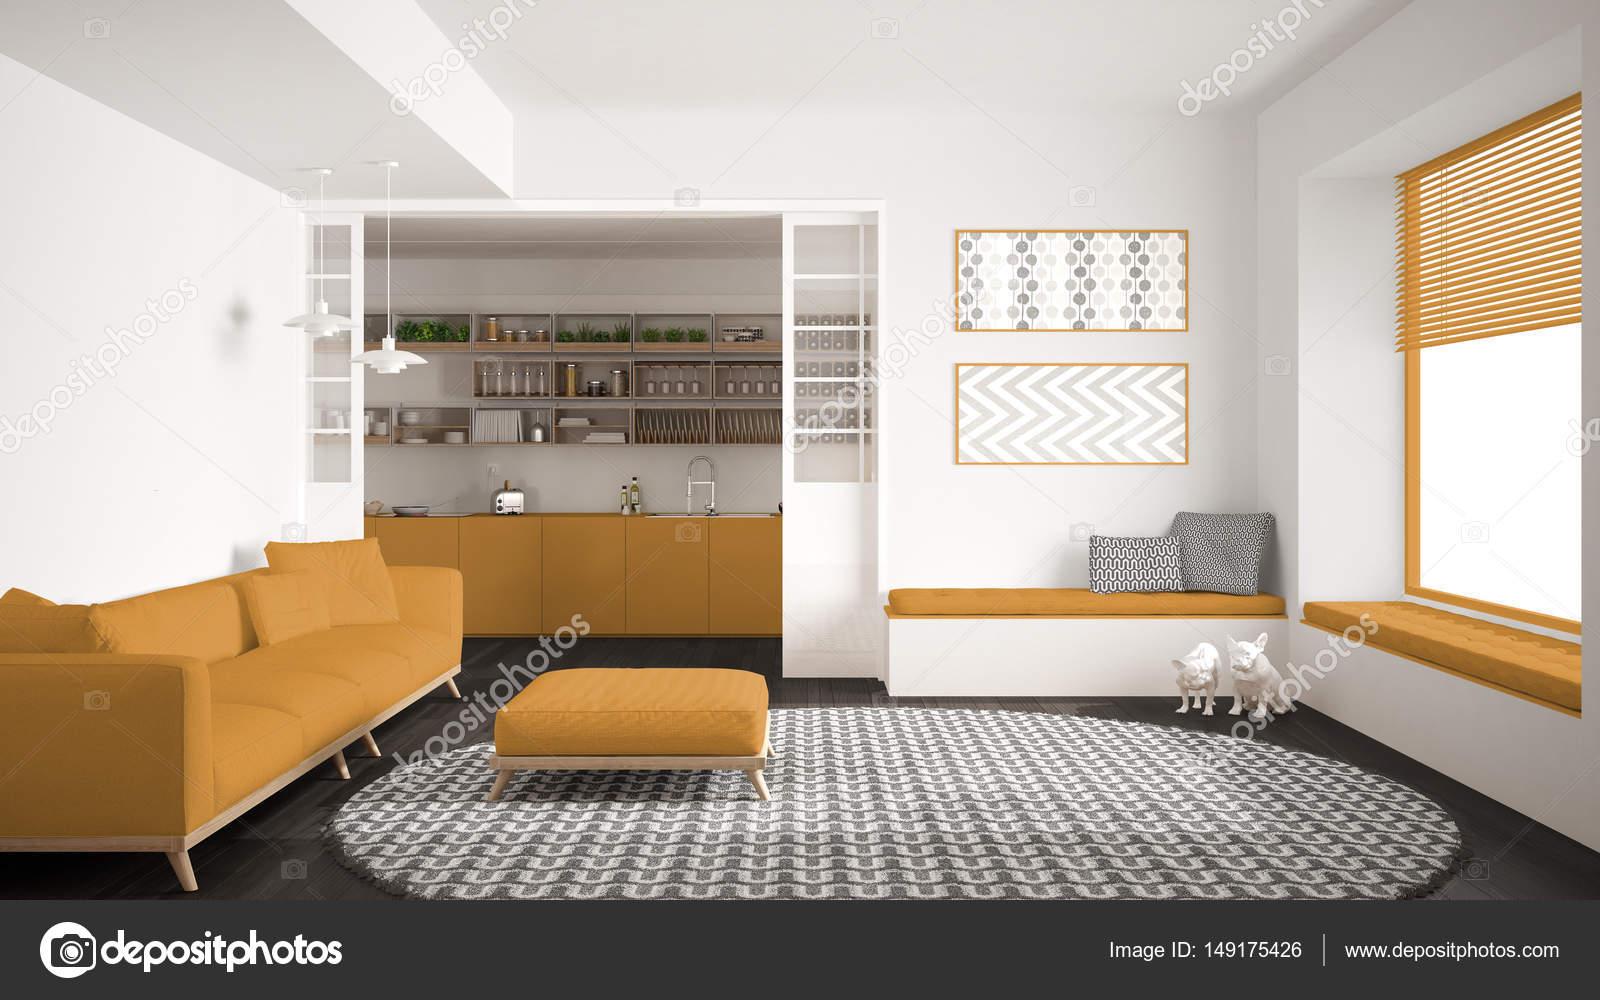 large kitchen rug holiday rugs 极简主义生活一会议室的沙发上 又大又圆的地毯和厨房 图库照片 极简主义客厅的沙发上 又大又圆的地毯和背景 白色和黄色的现代室内设计中的厨房 照片作者archiviz